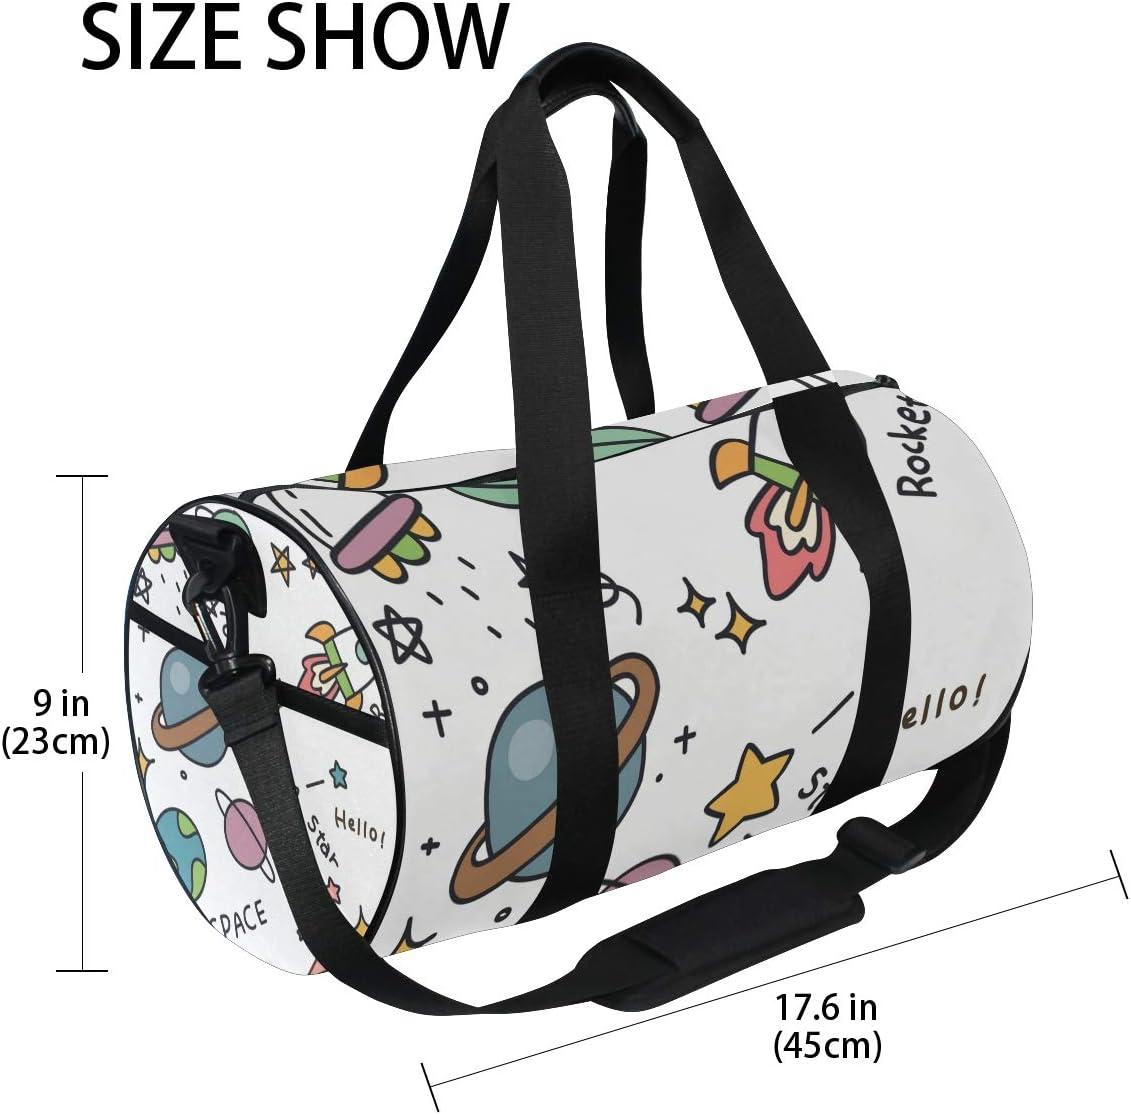 MALPLENA Rocket Space Star Drum gym duffel bag women Travel Bag